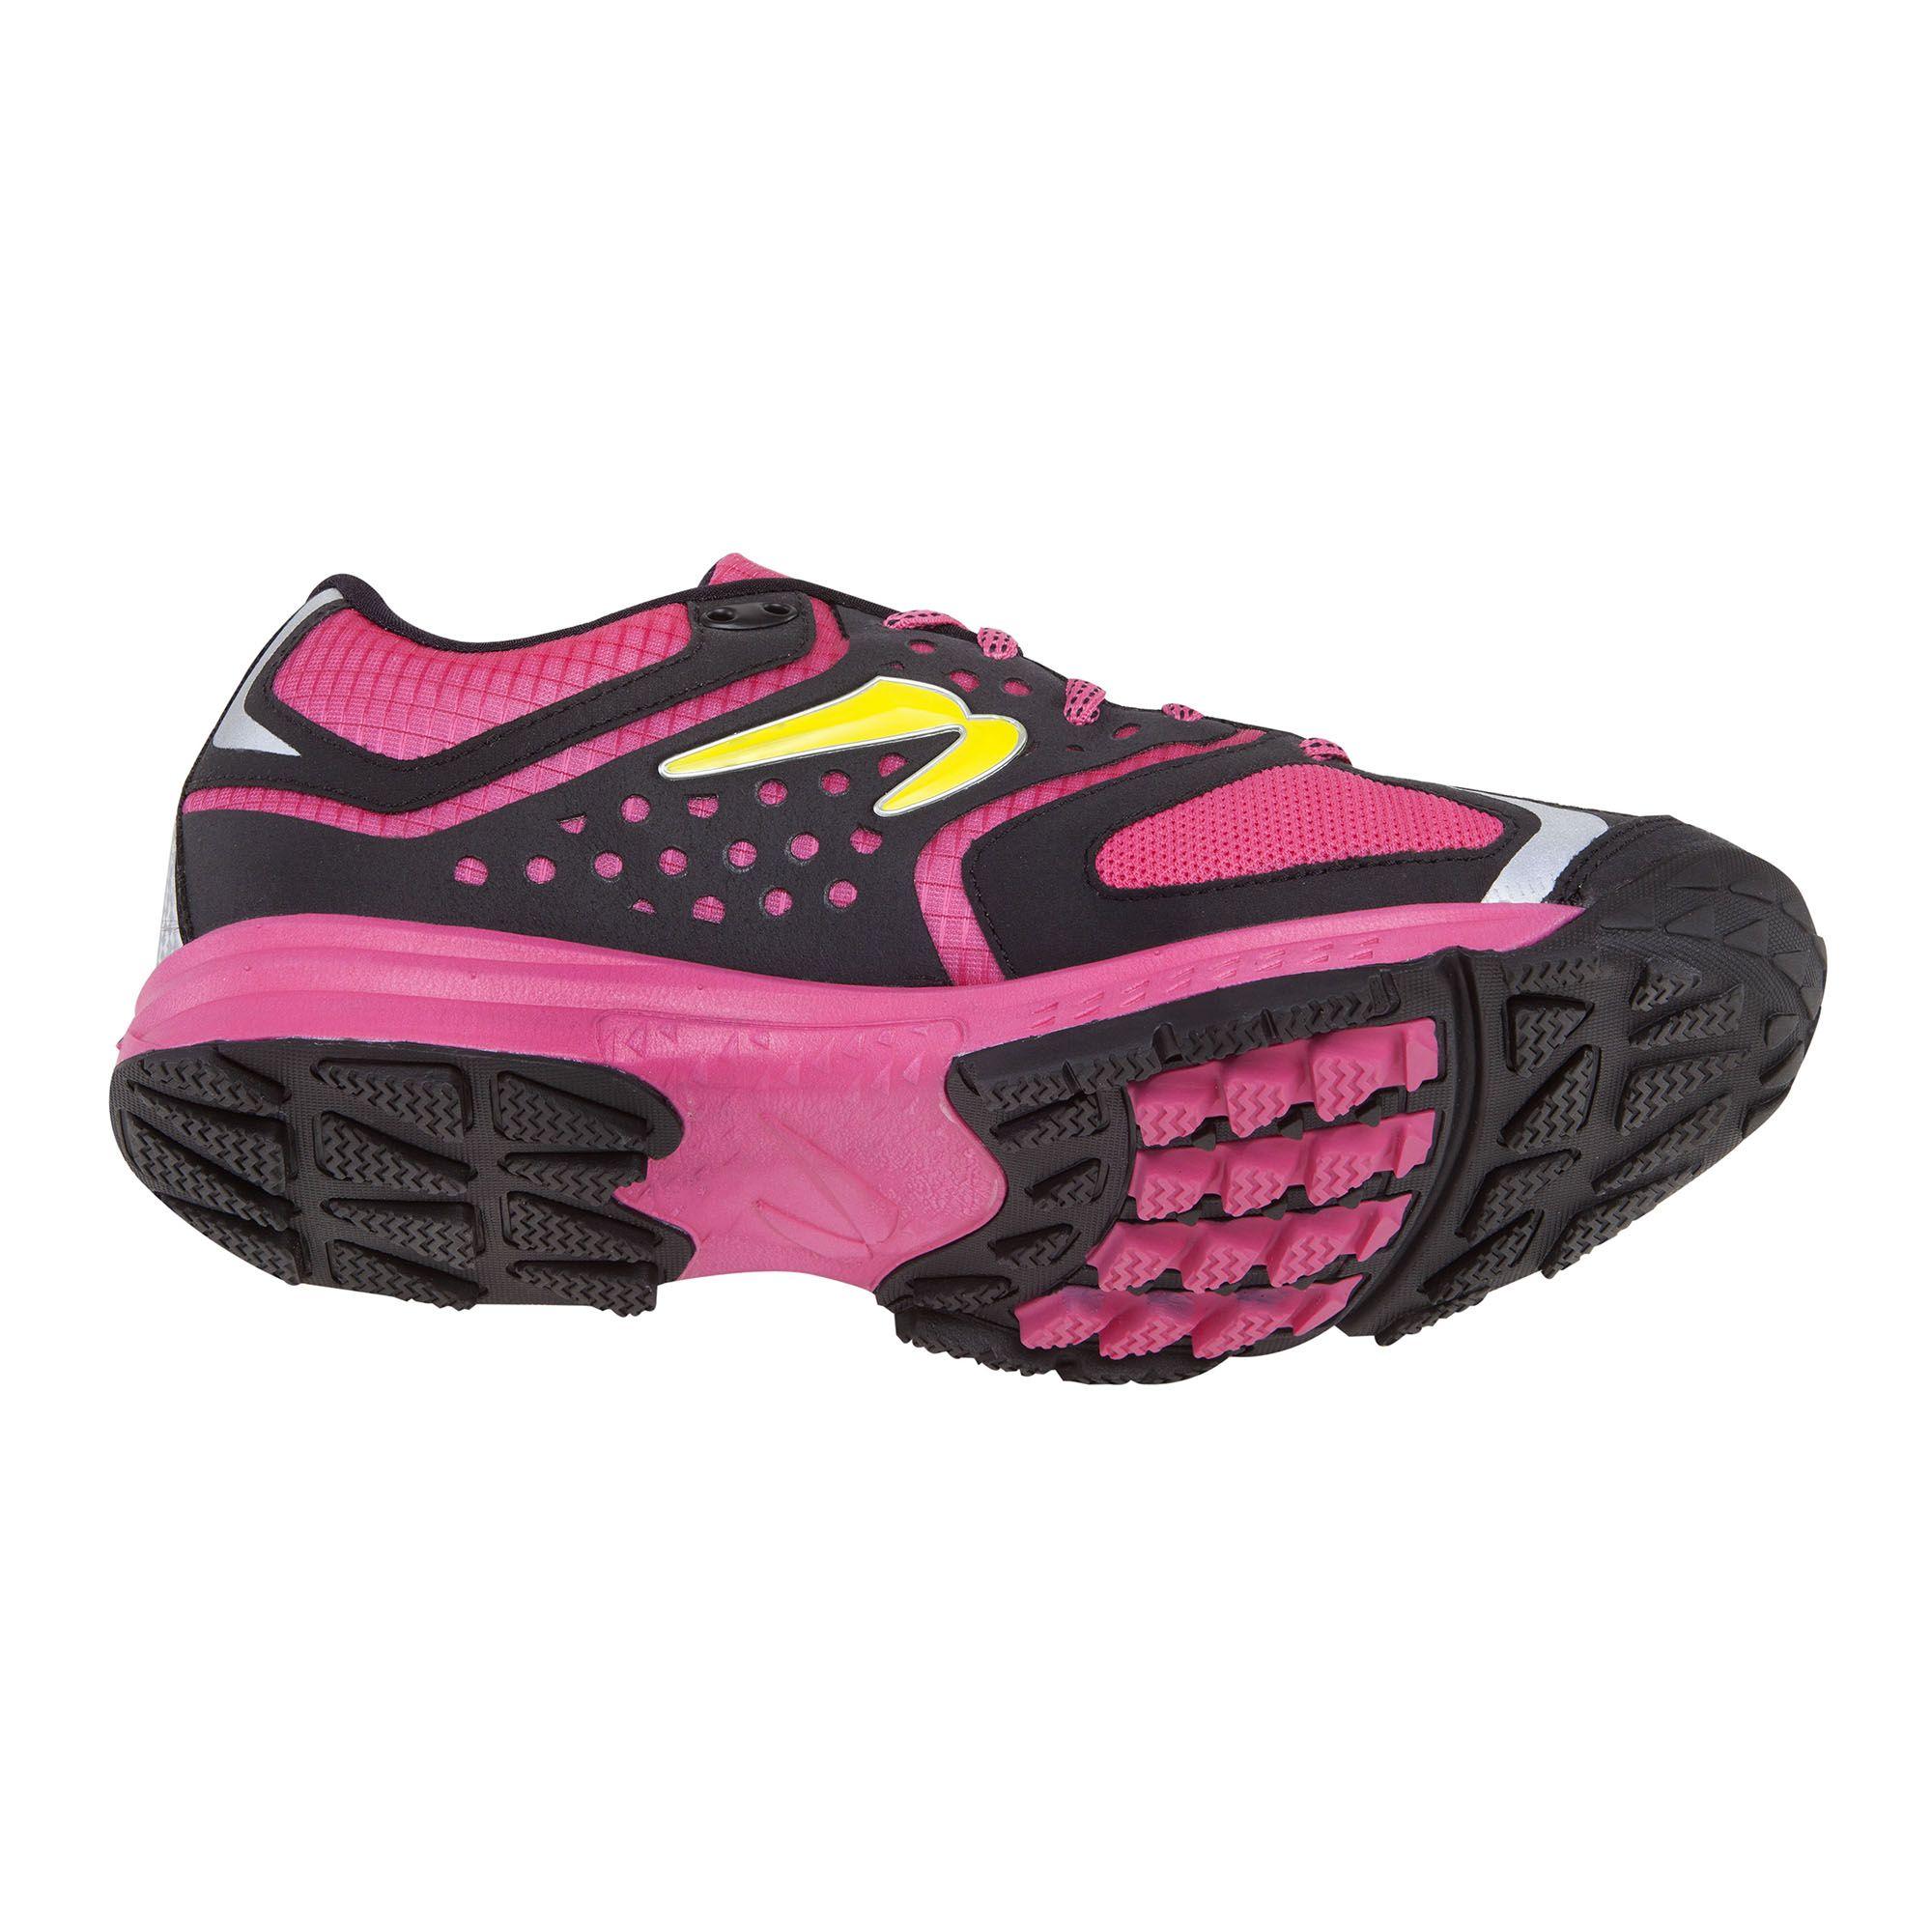 Cheap Ladies Trail Running Shoes